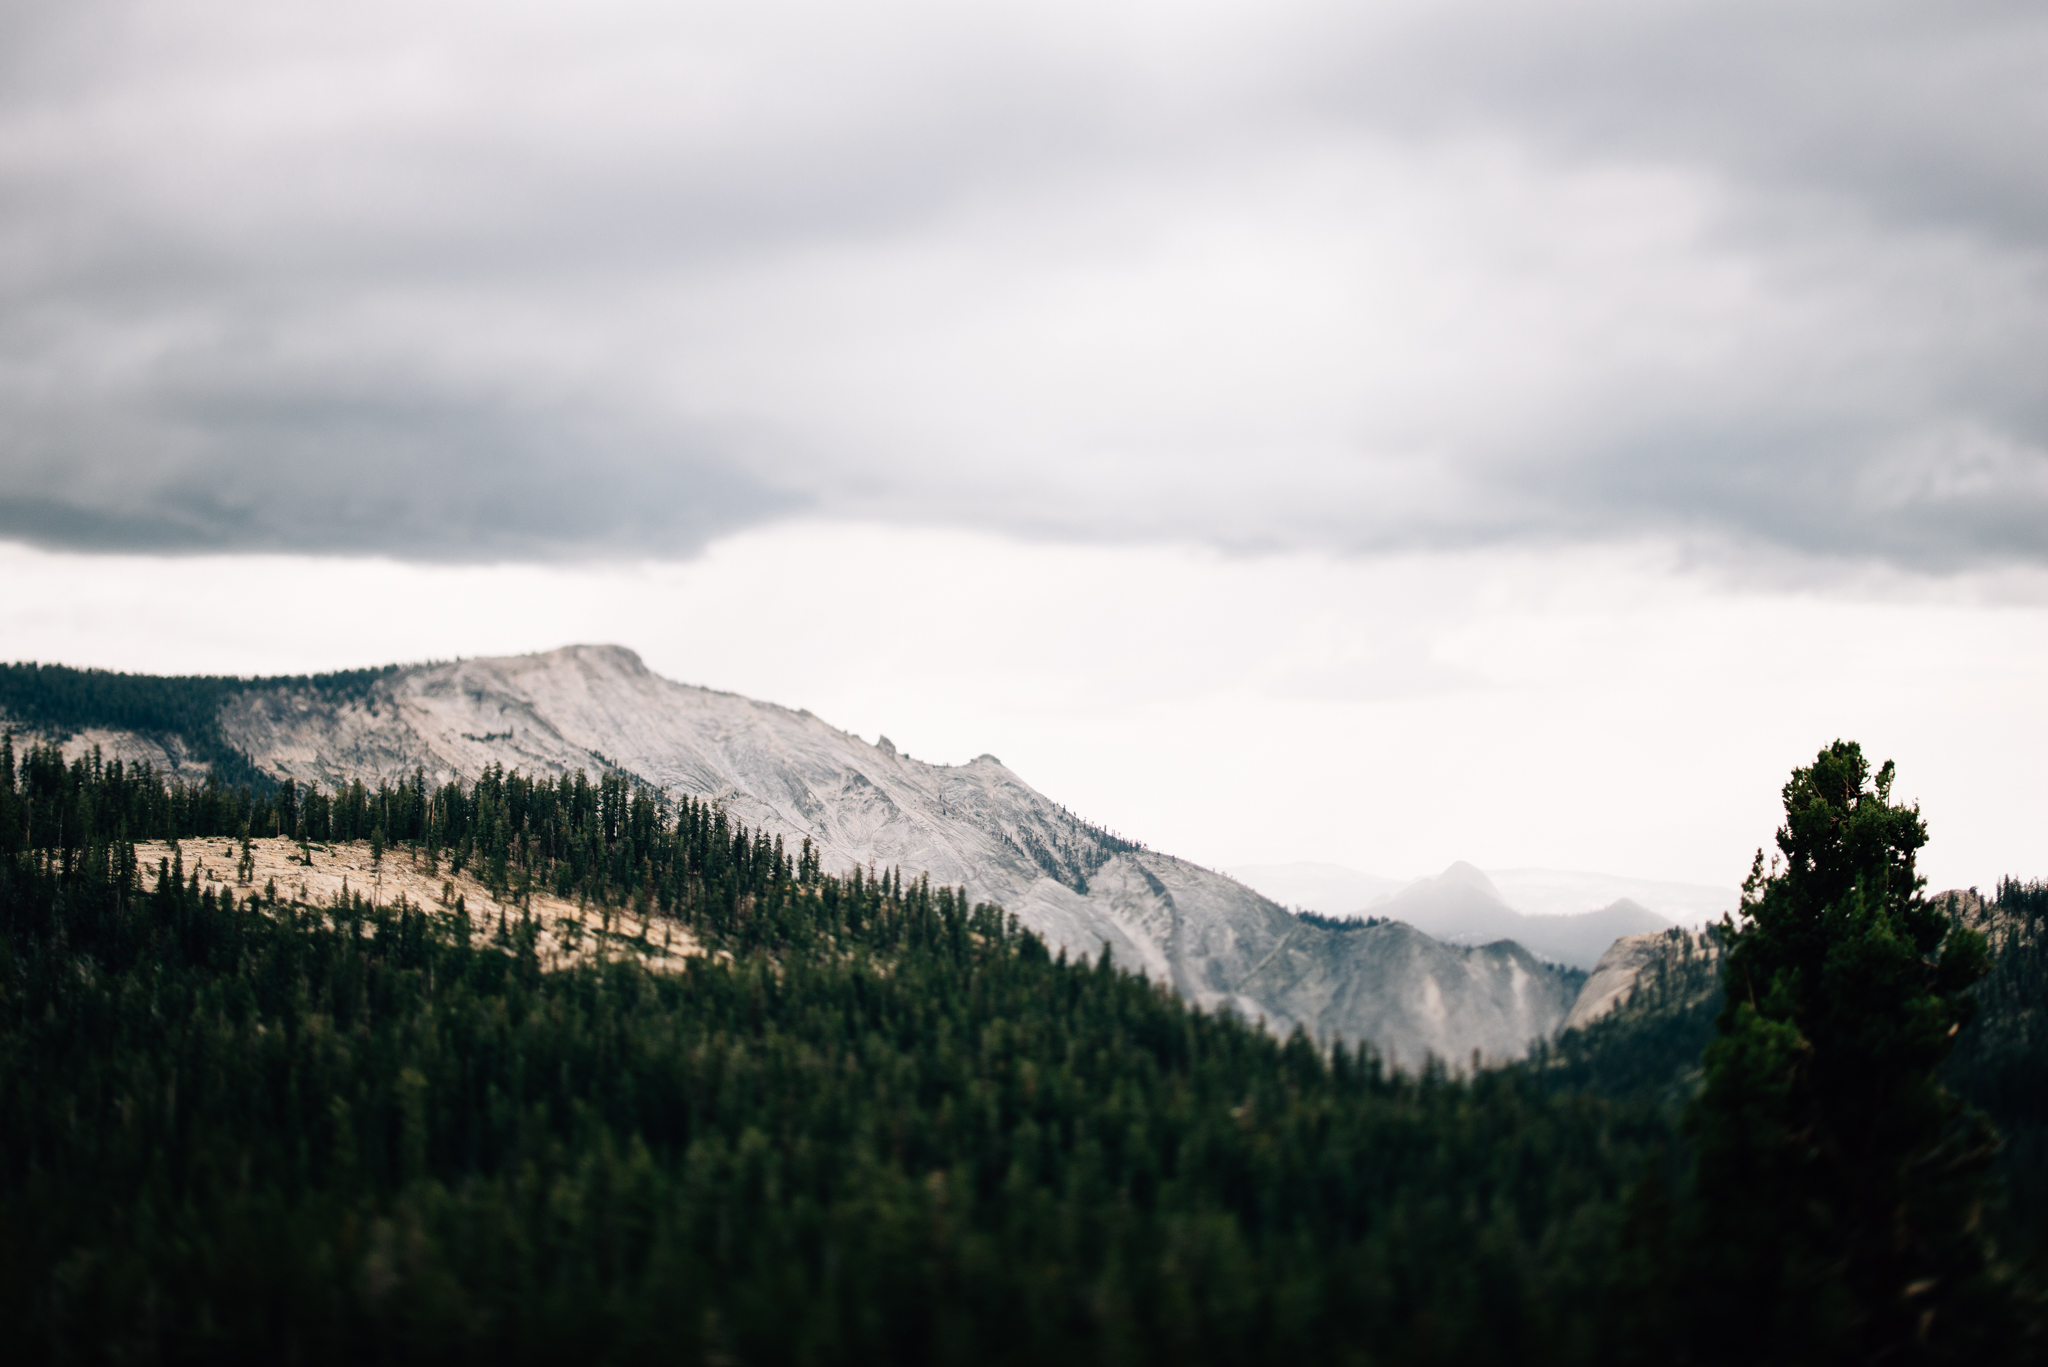 ©The Ryans Photography - Los Angeles Travel - Tuolomne Meadows Yosemite-027.jpg